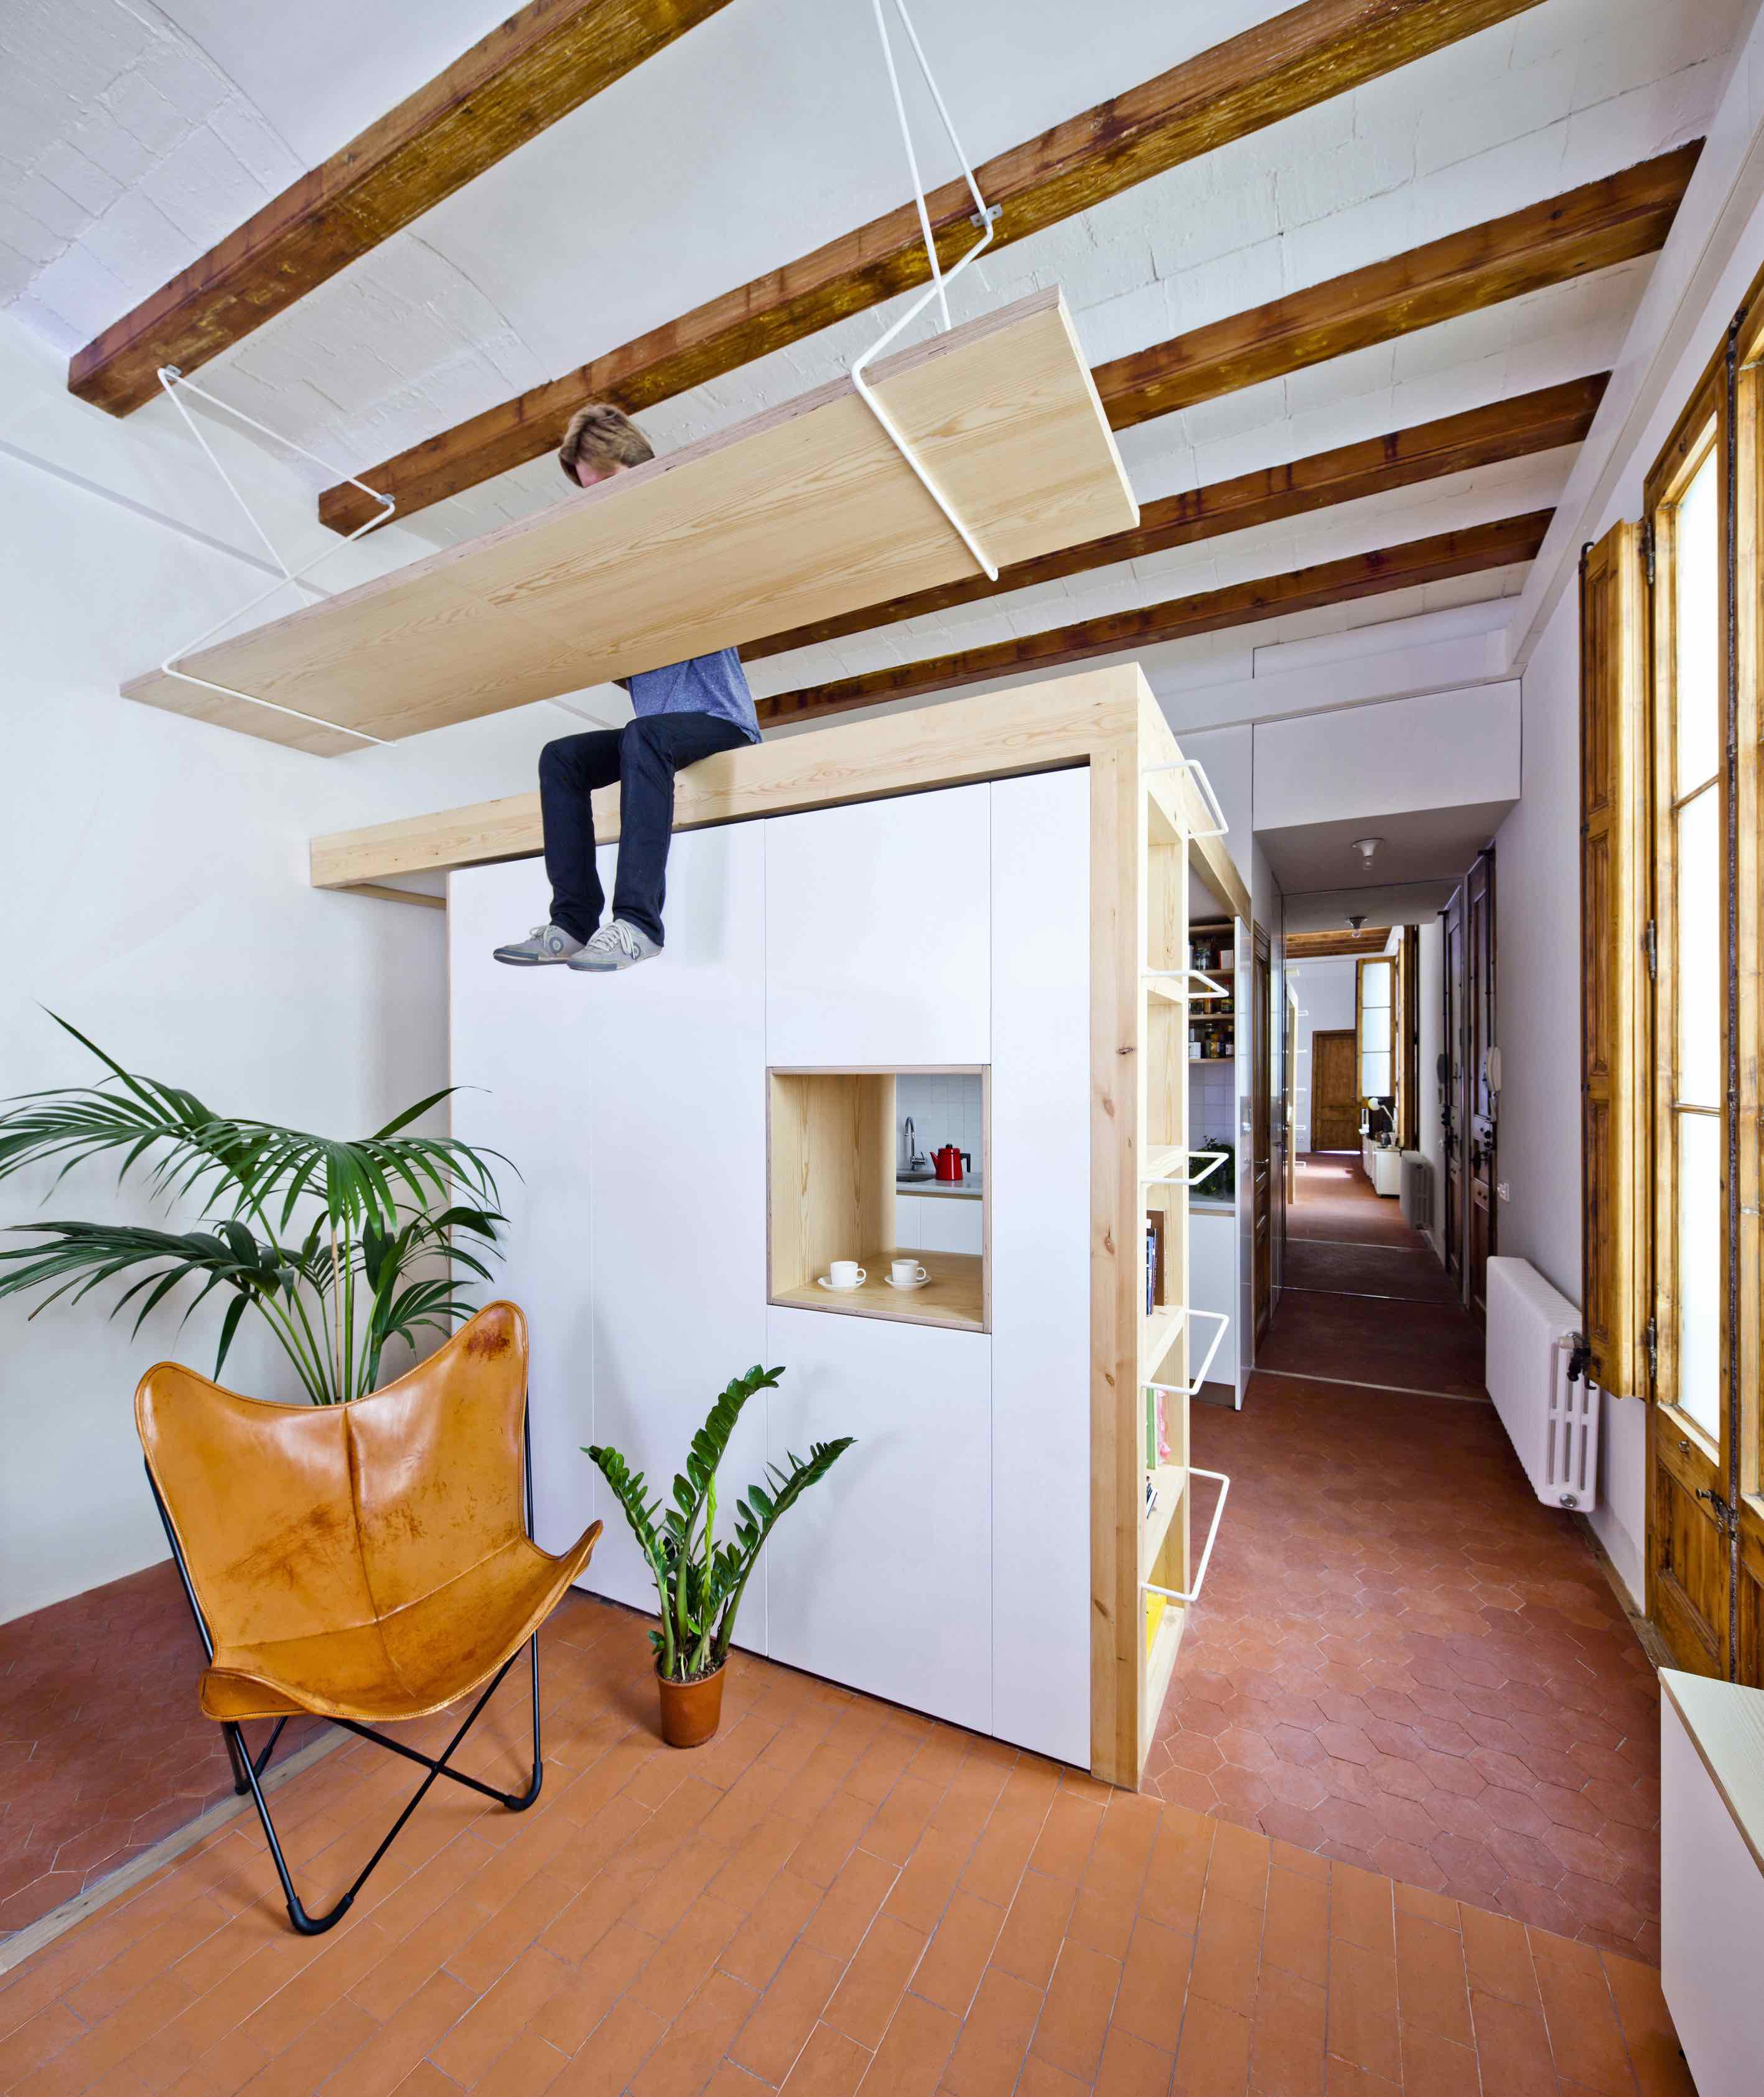 Gran Via Apartment, Barcelona, Spain, design: Anna & Eugeni Bach<br />Photo: Eugeni Bach Gran Via Apartment copy